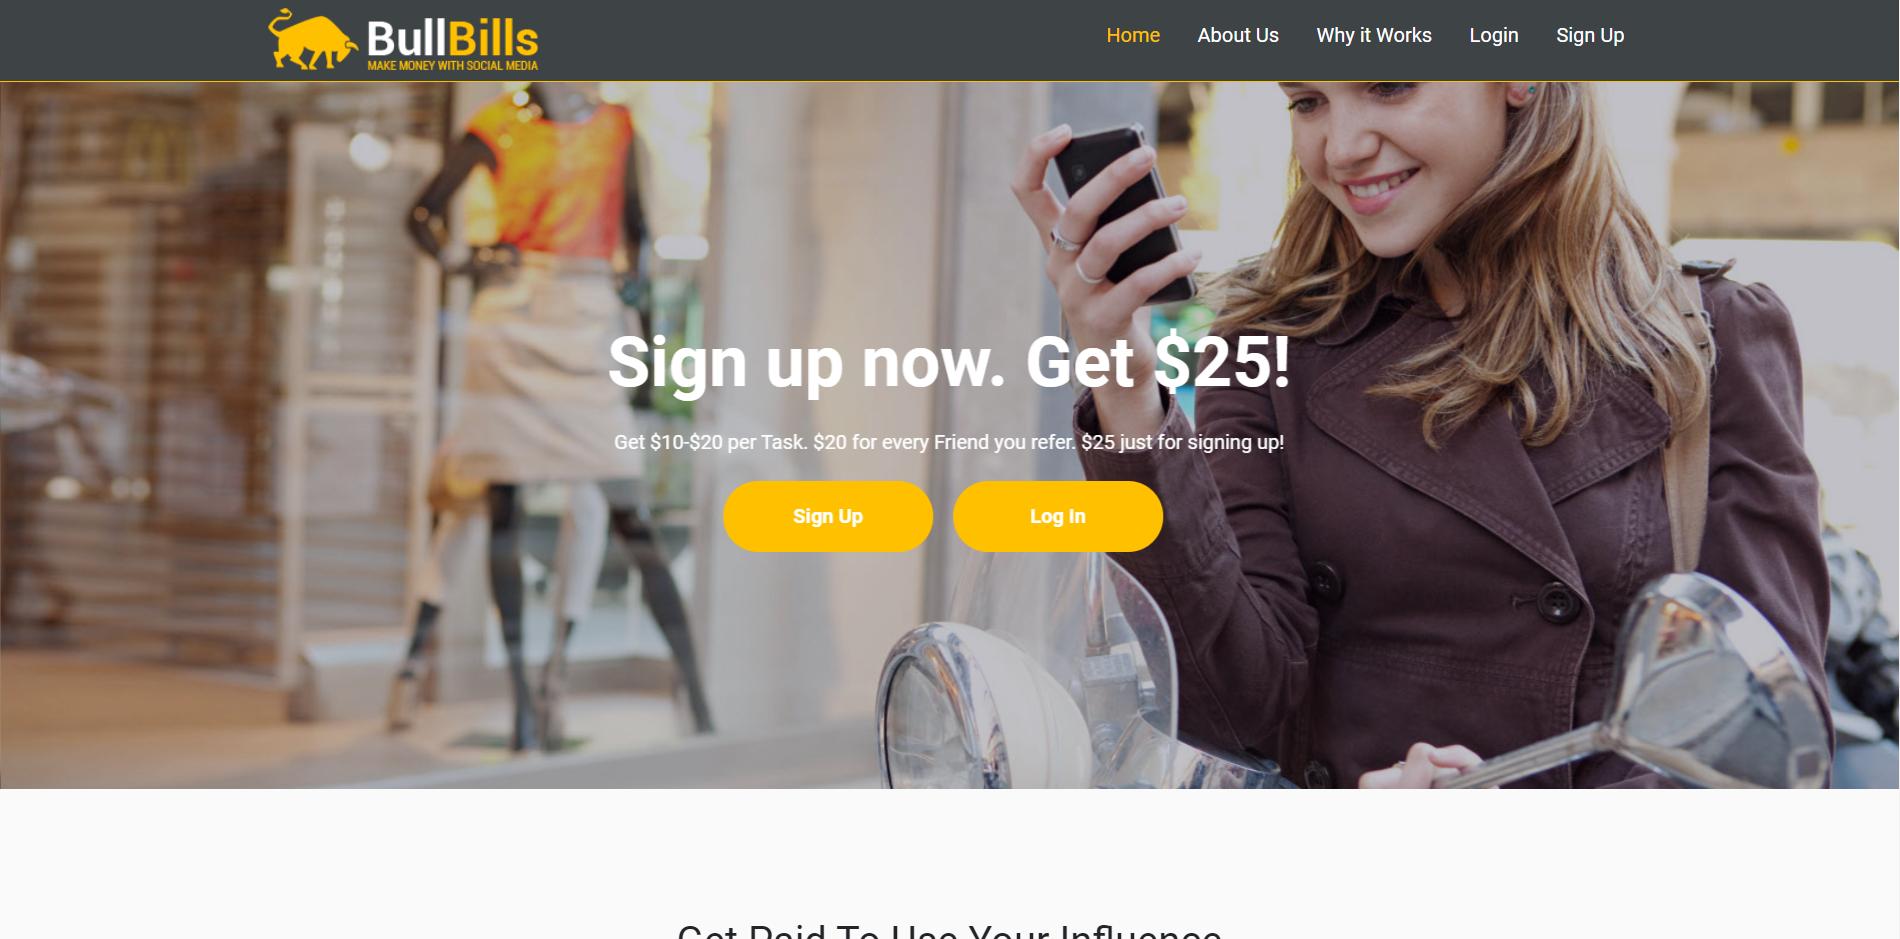 BullBills Main Page